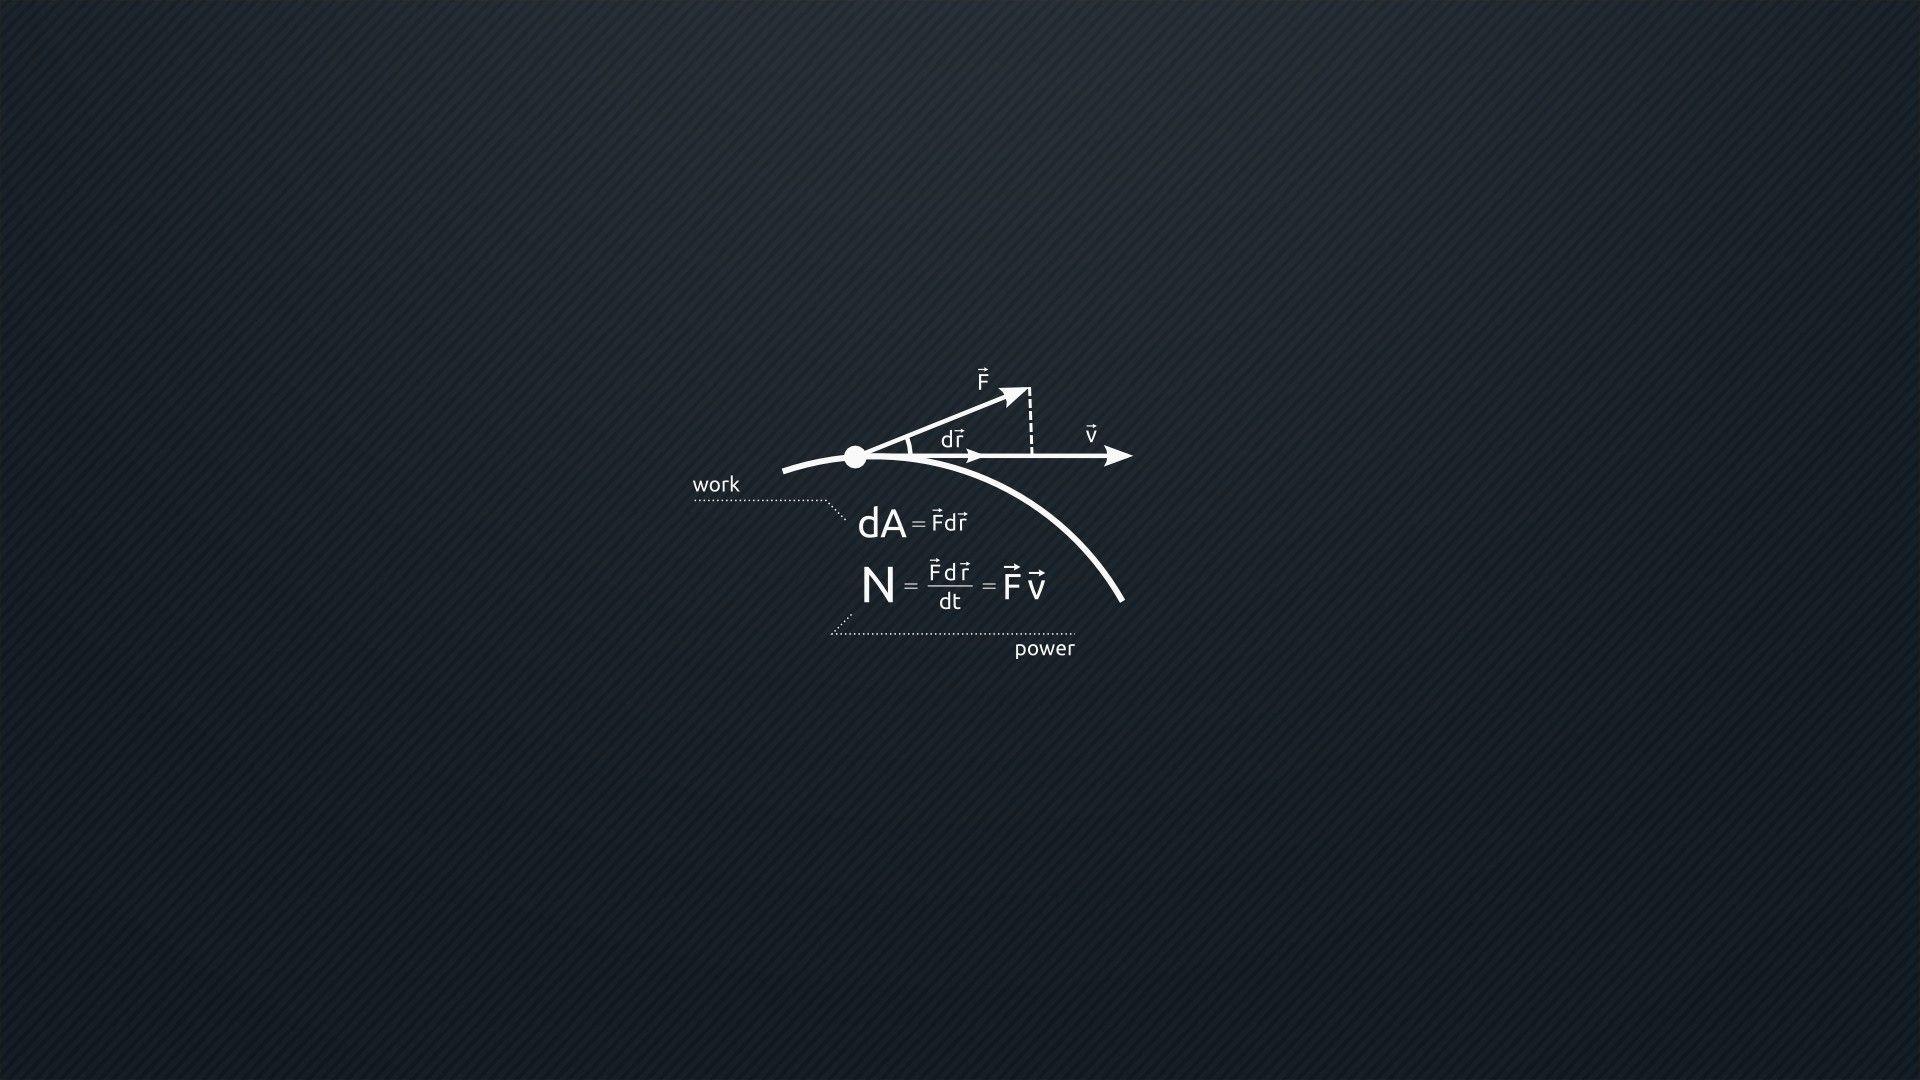 Physics [1920x1080] Need iPhone 6S Plus Wallpaper/